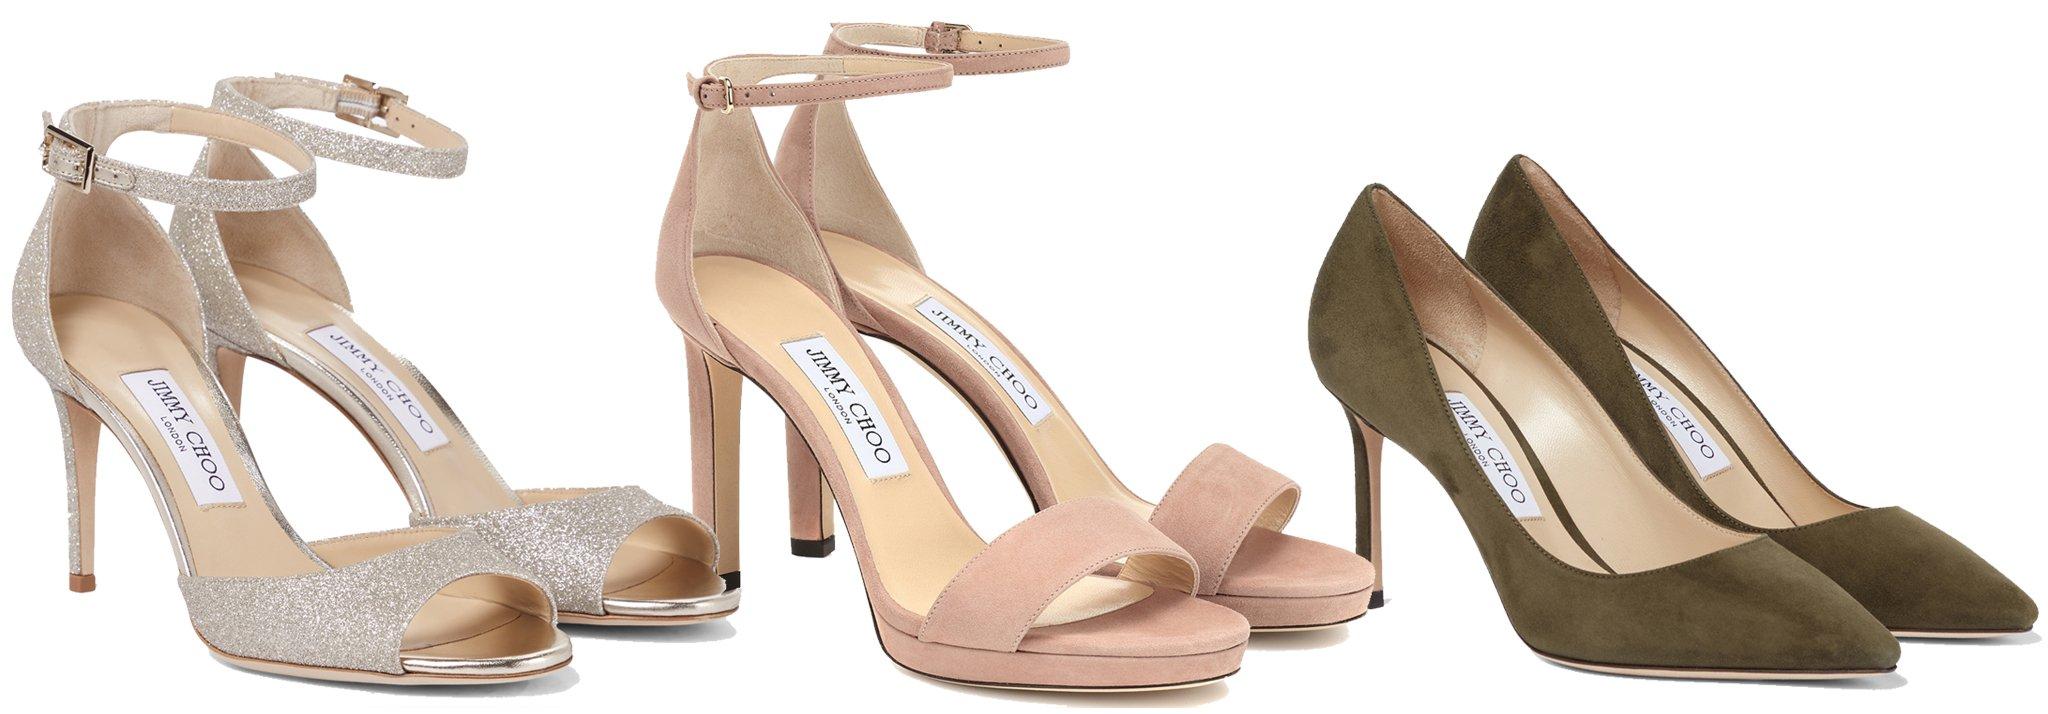 Jimmy Choo Annie Sandals, $725; Jimmy Choo Misty Sandals, $700; and Jimmy Choo Romy Pumps, $577